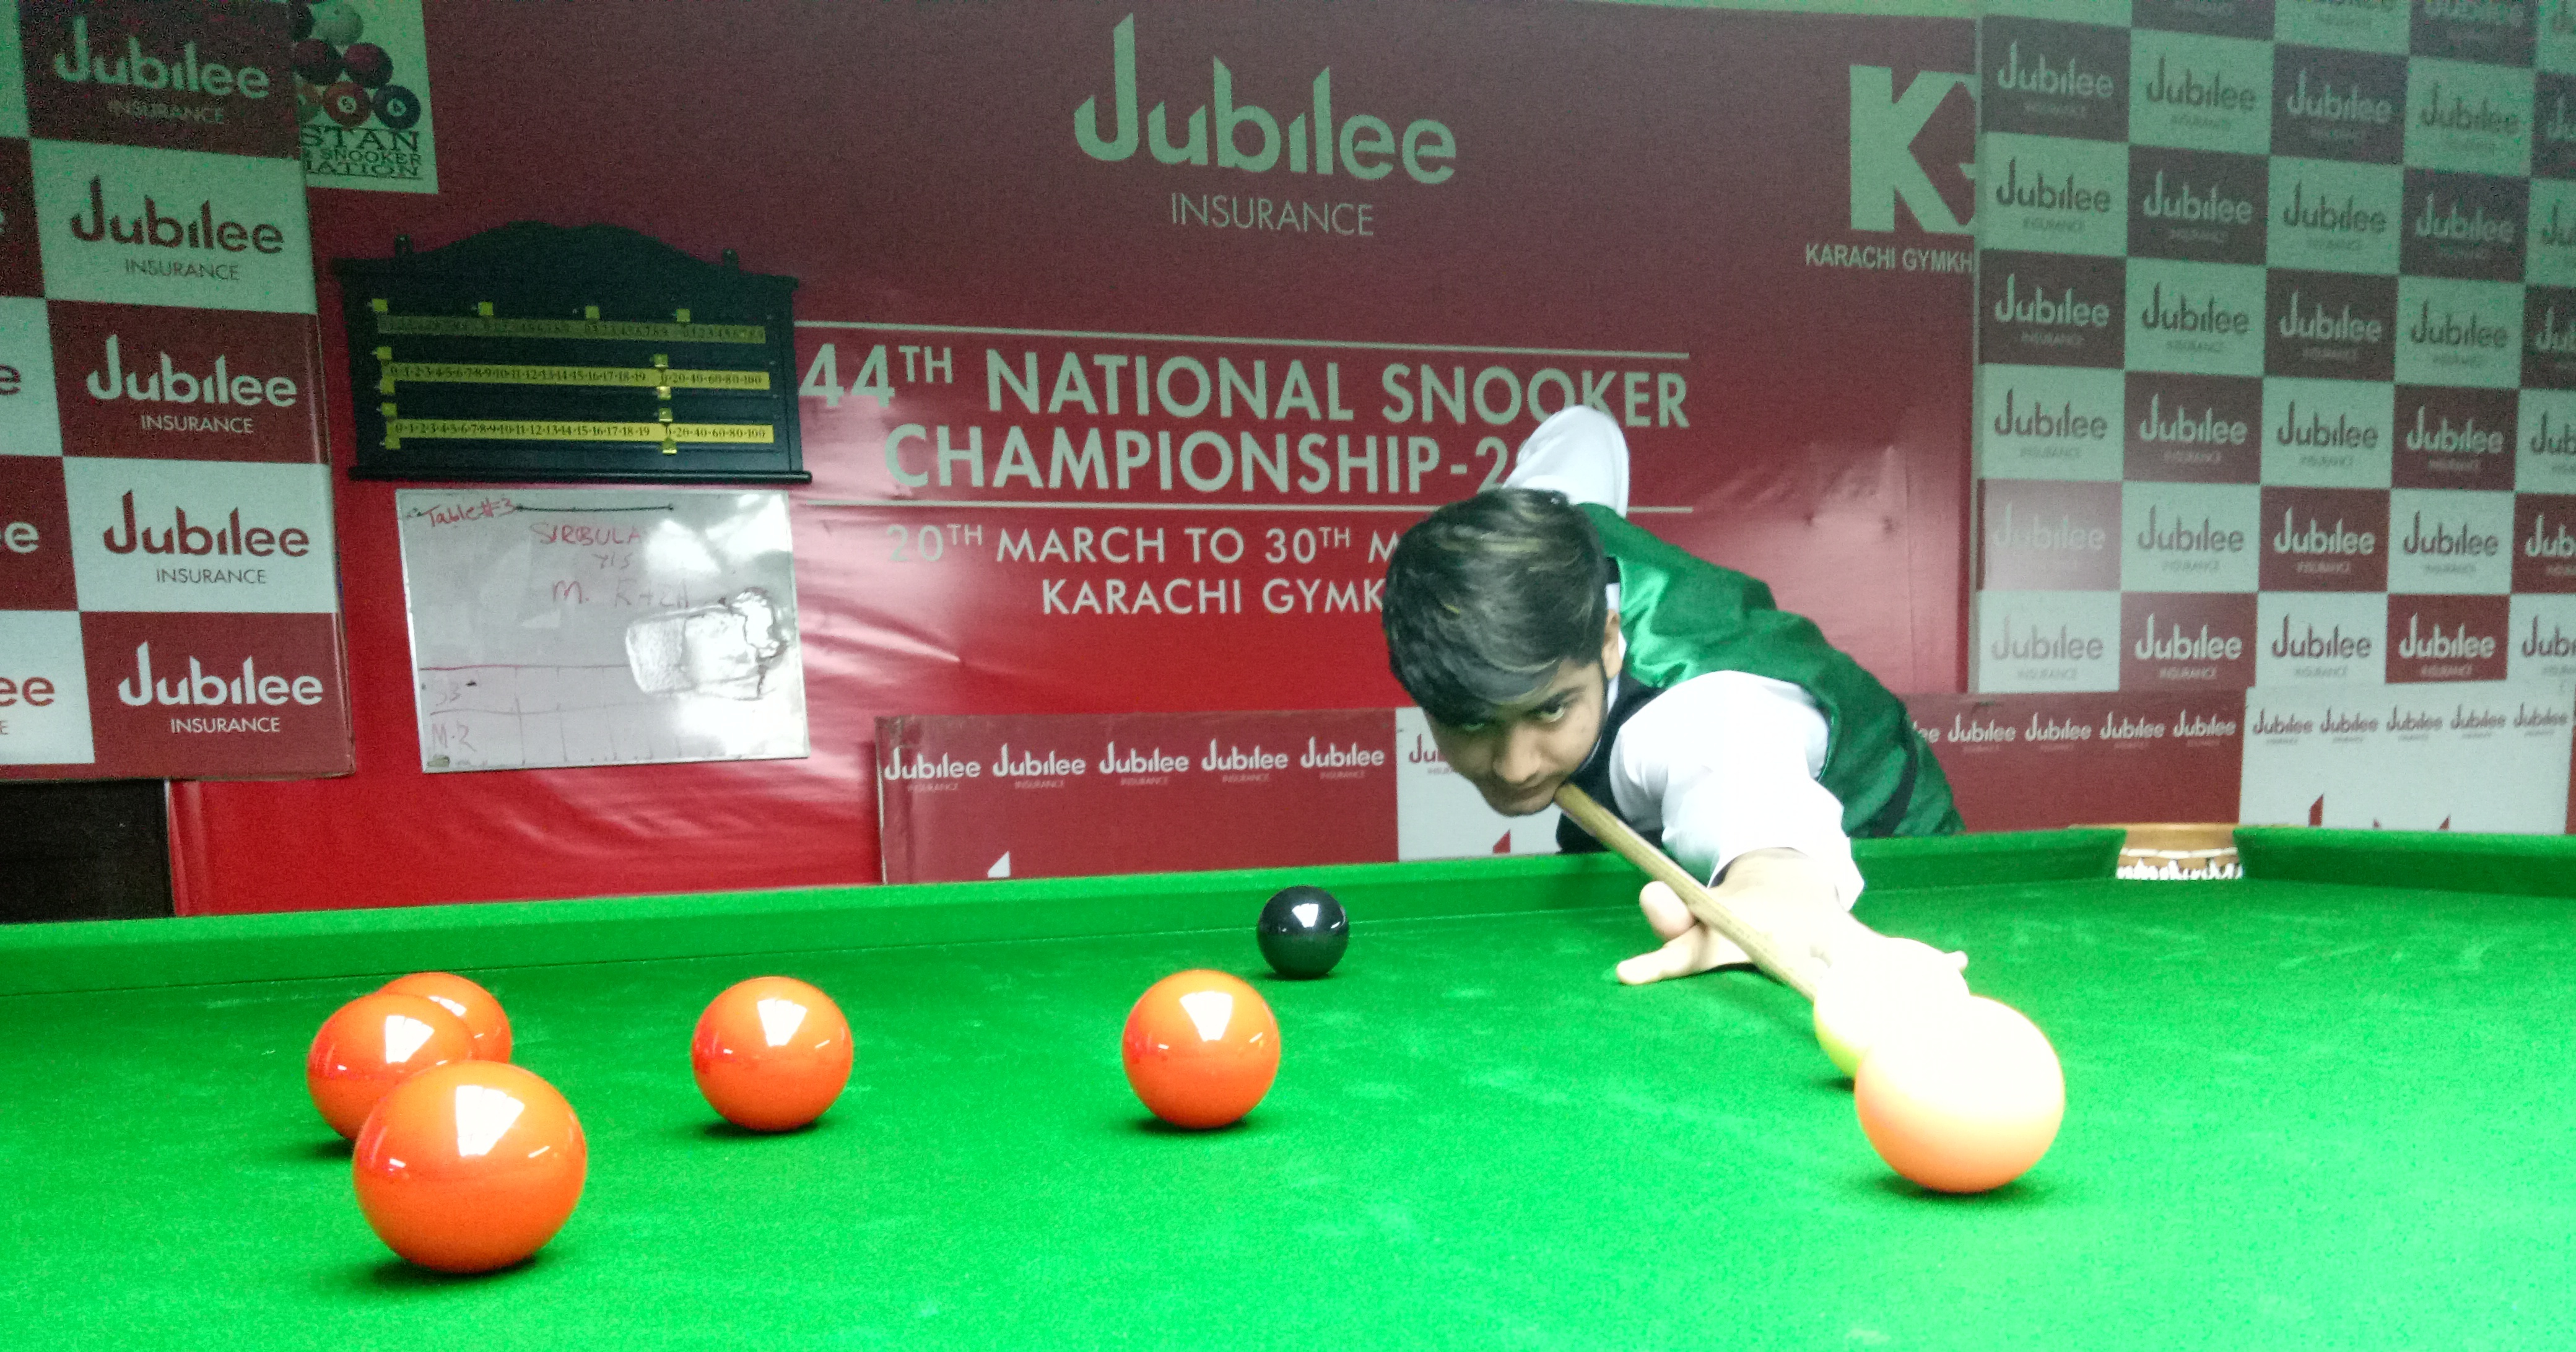 National Snooker Championship 2019